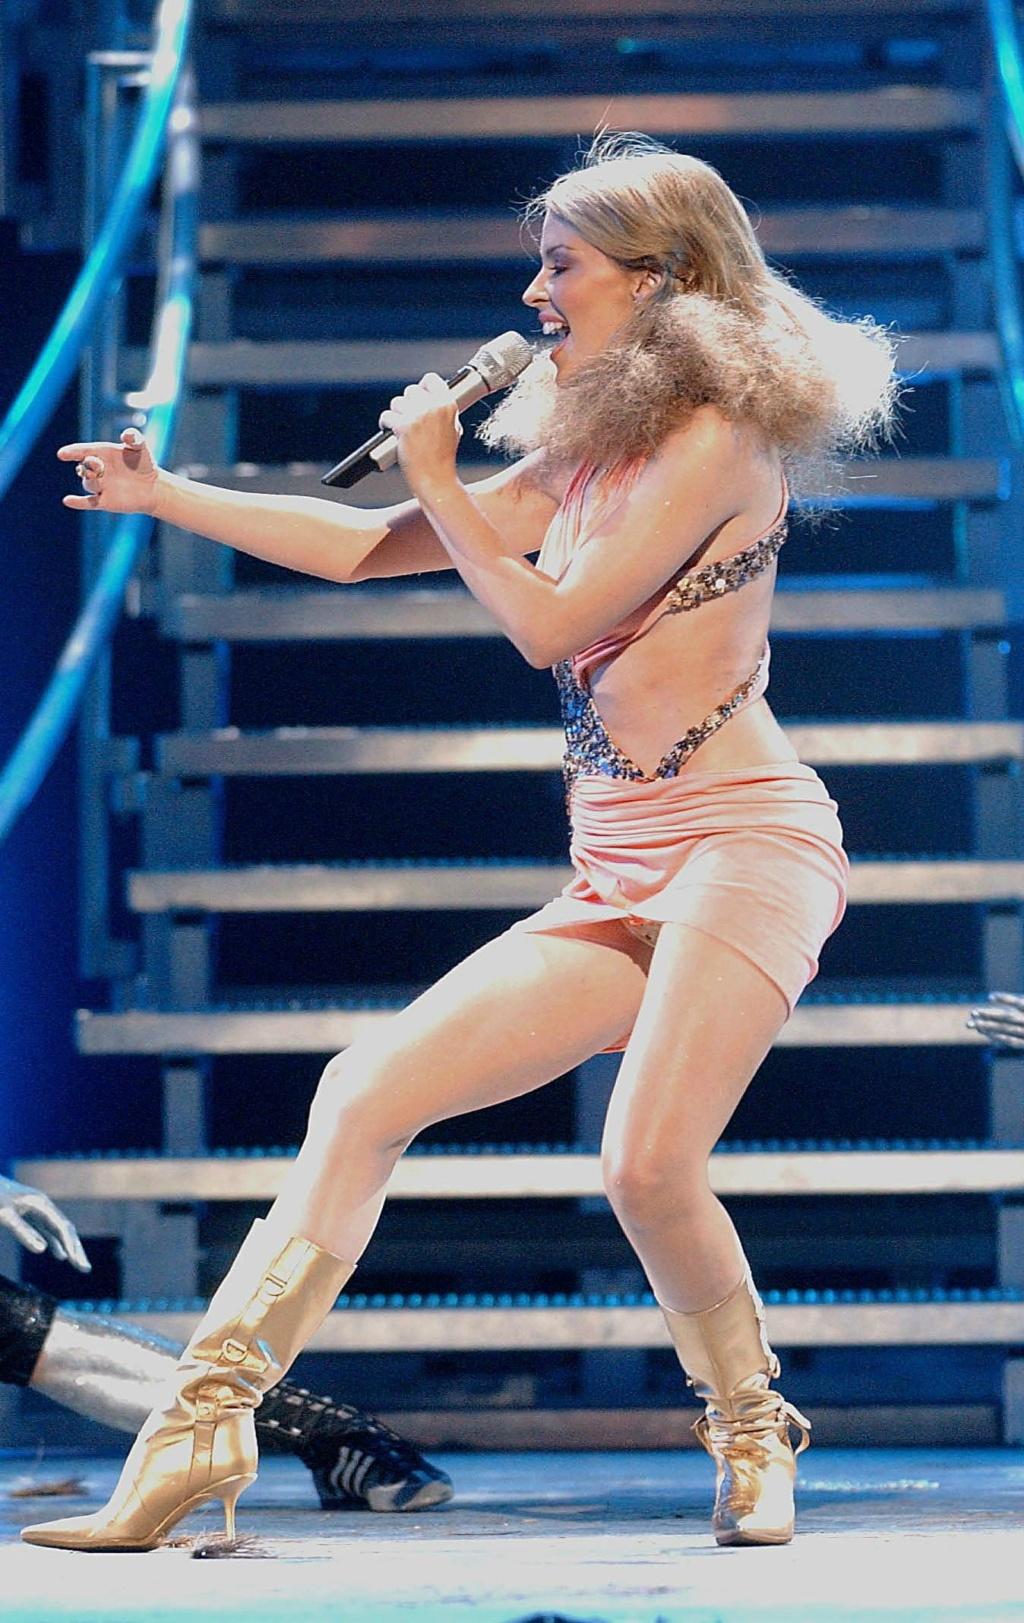 Kylie Minogue Kf5wq10